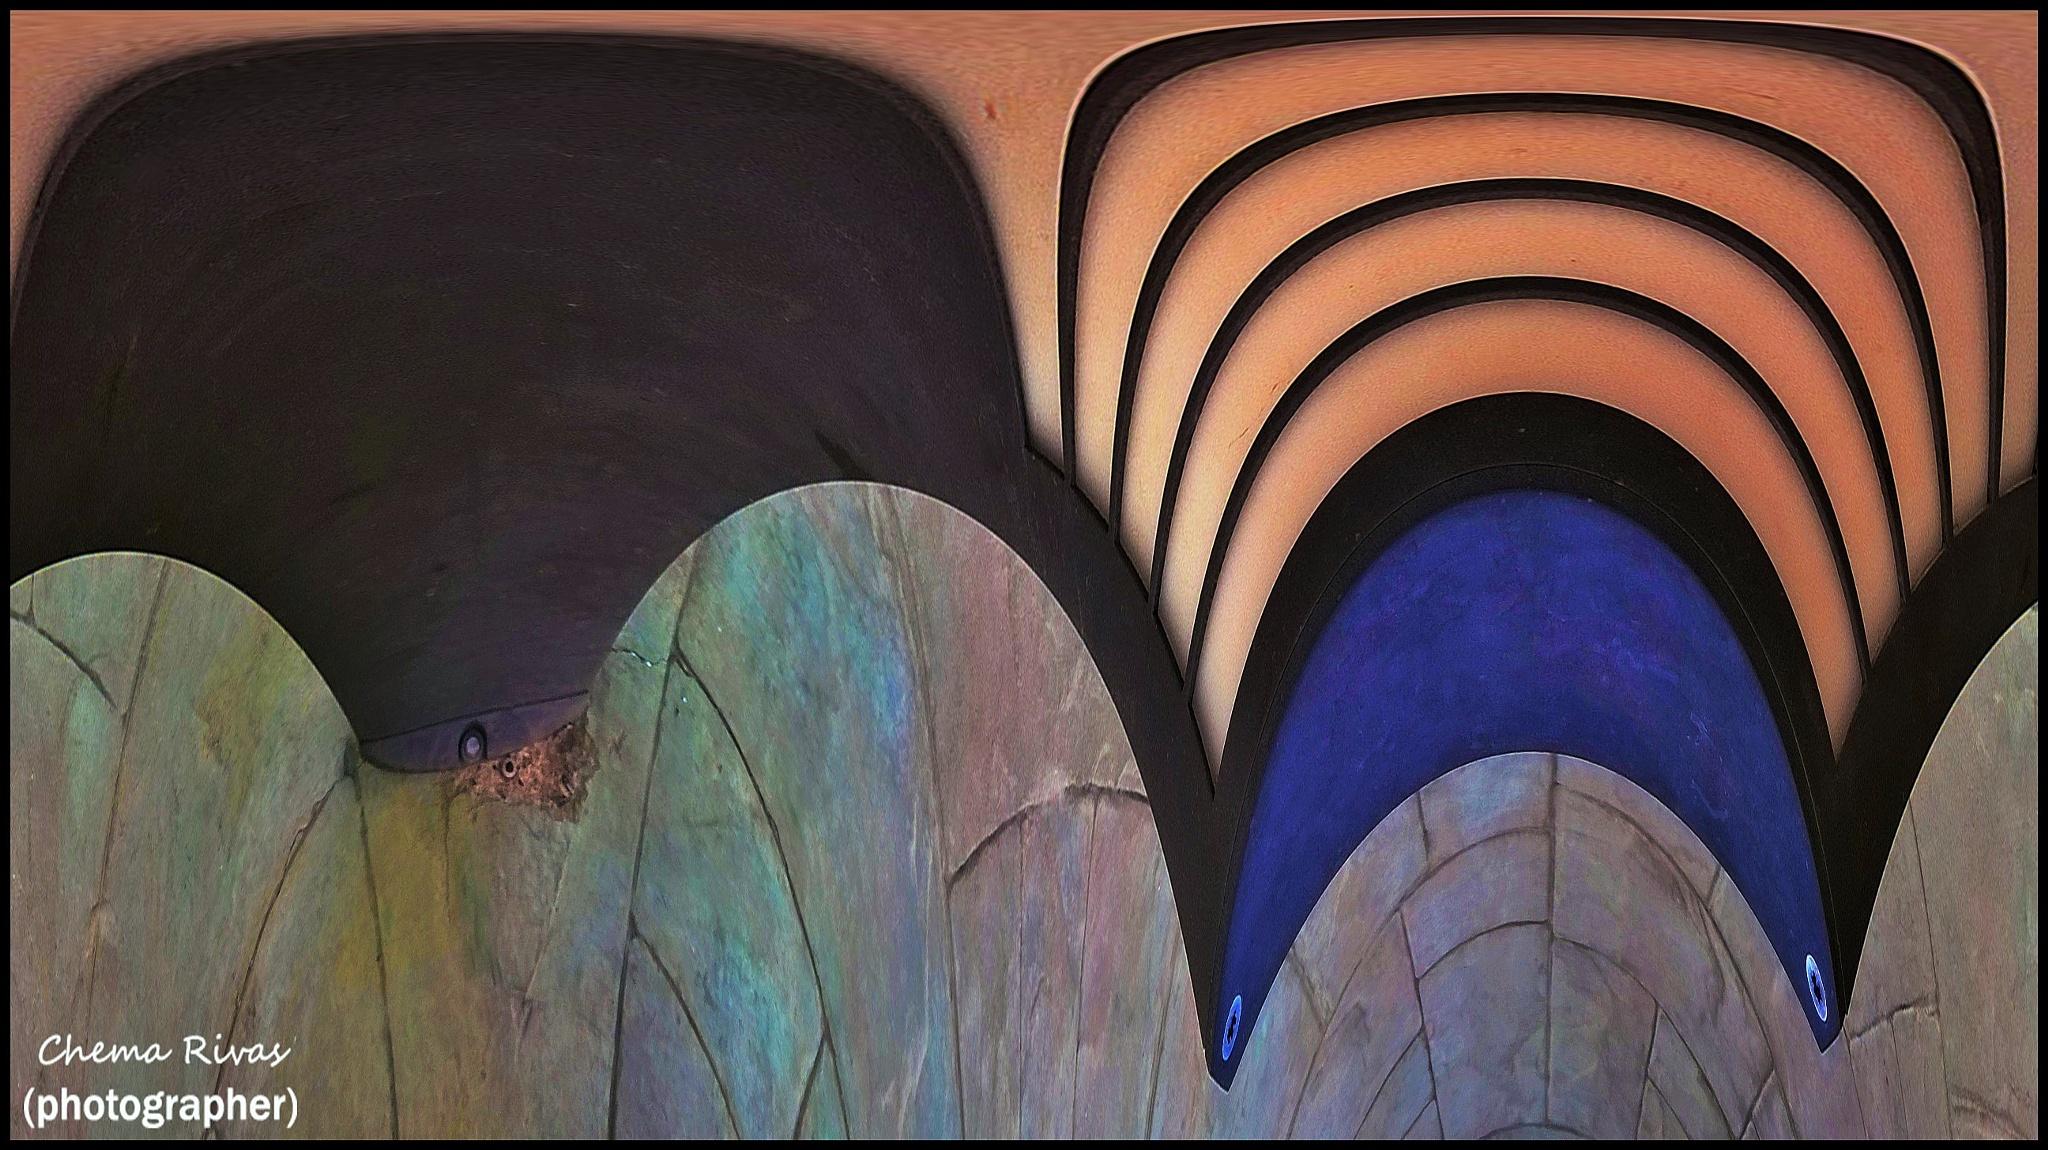 Serie abstracta 2 by Chema Rivas